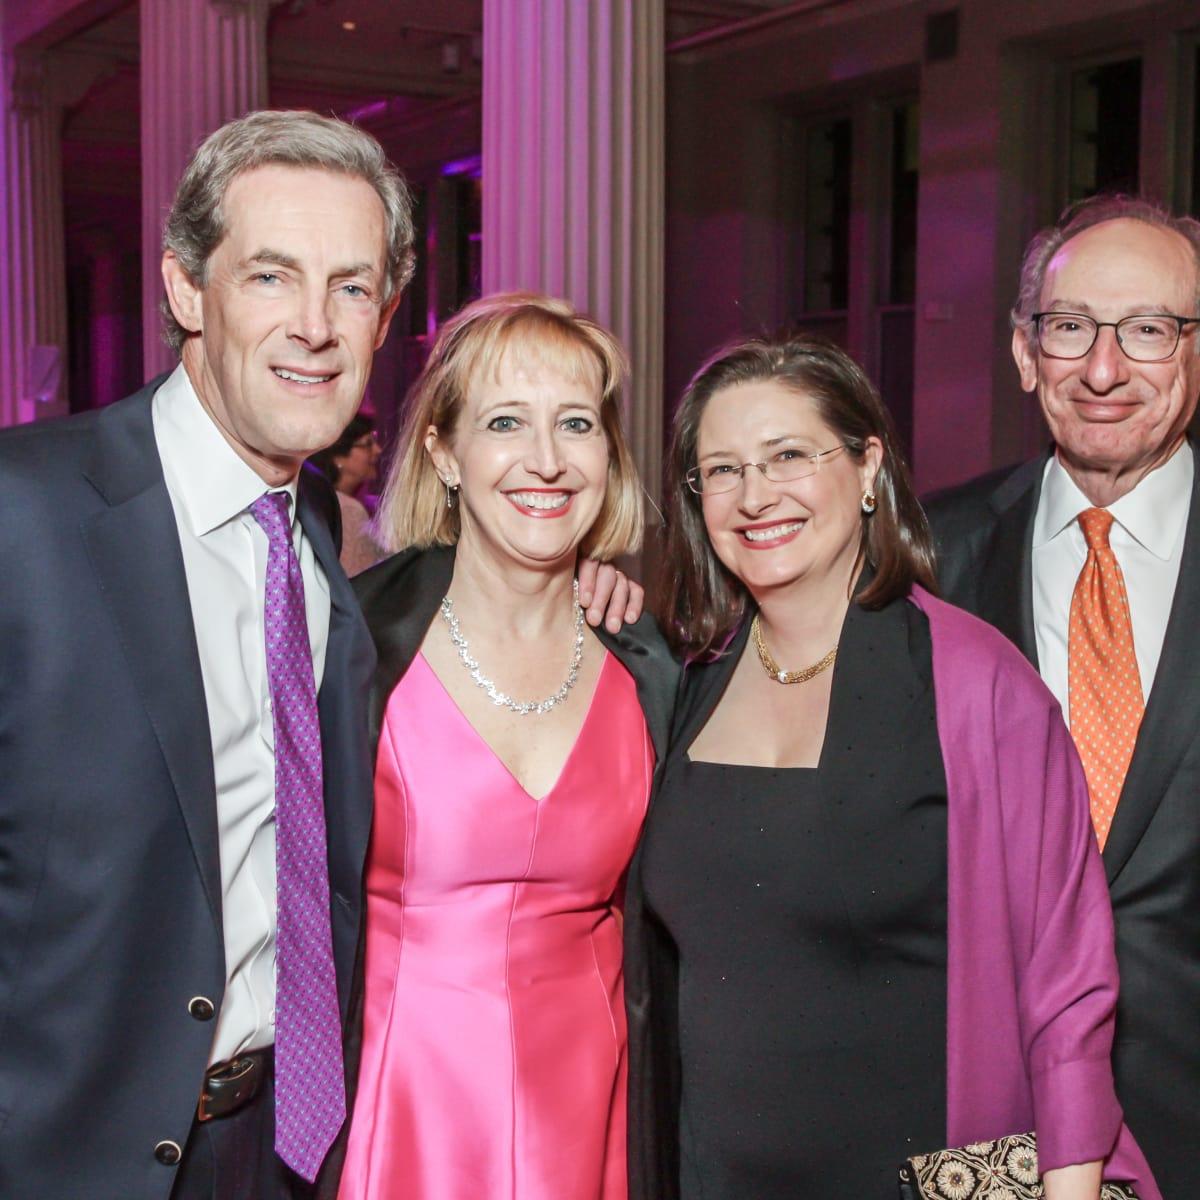 David Sterling, Kim Sterling, Laura Devitt, Stephen Massad at Club da Camera